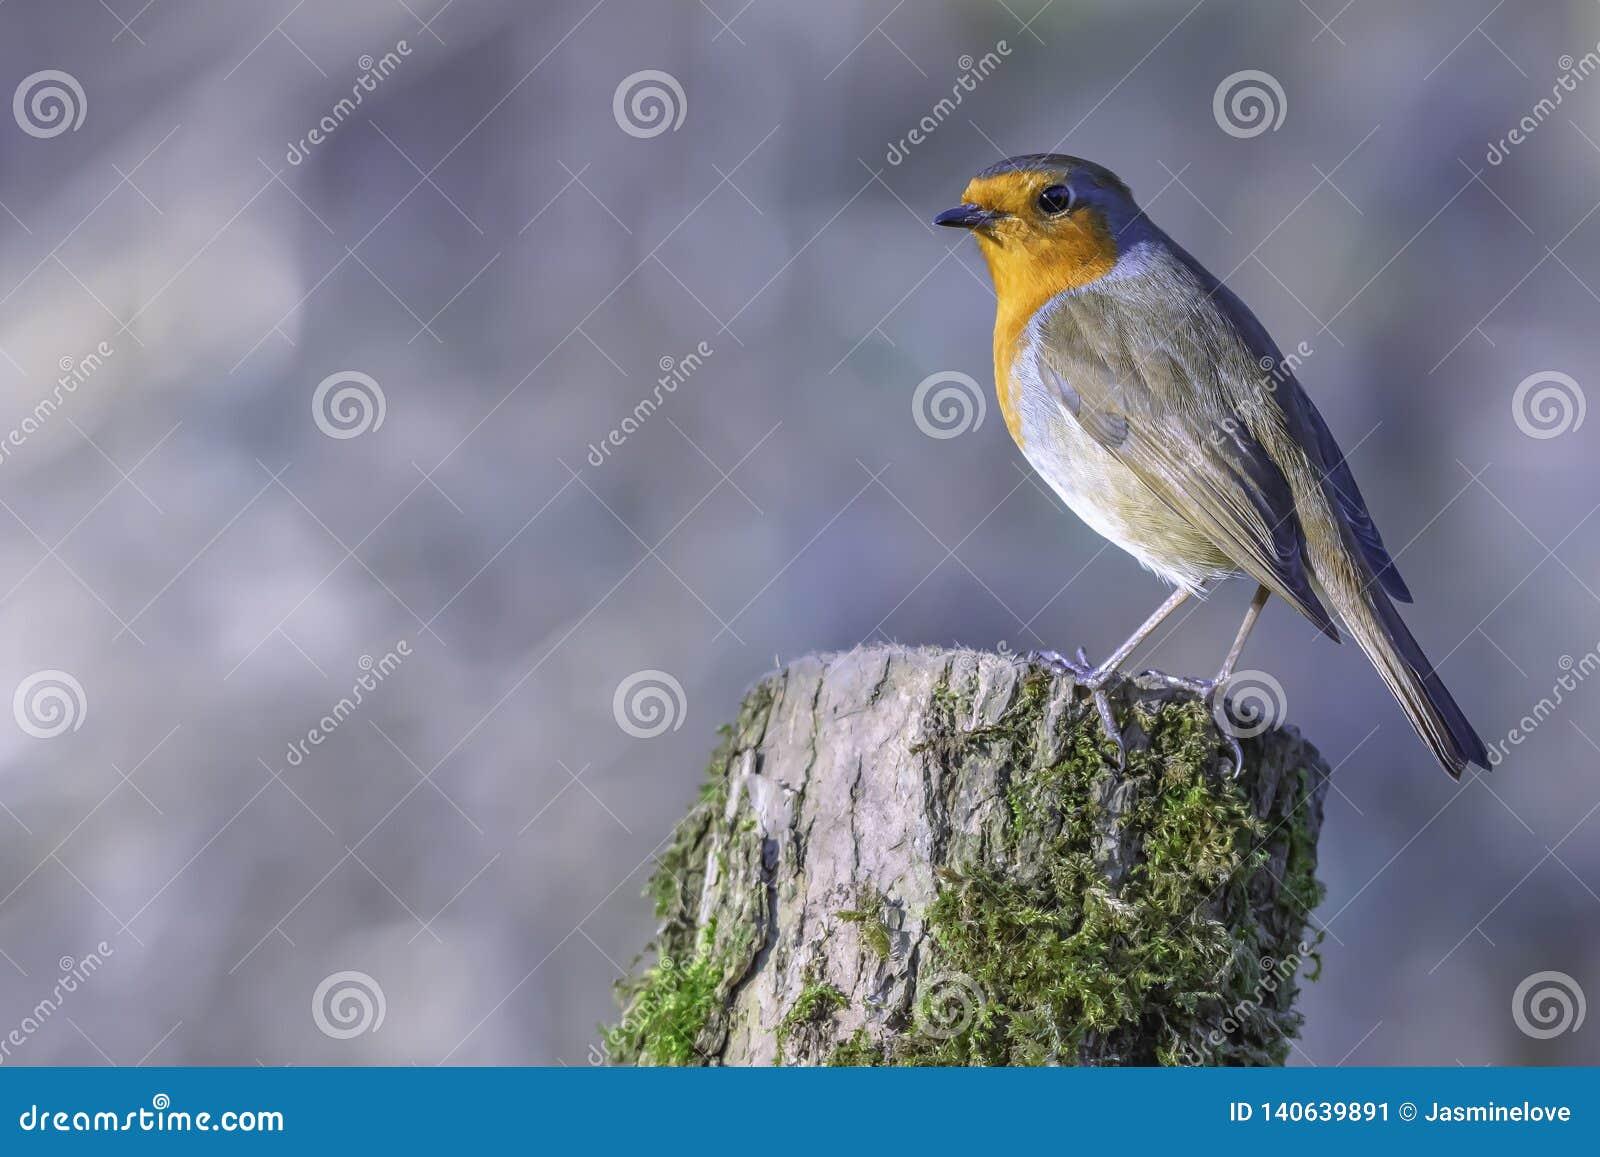 Europese Robin streek op boomboomstam neer